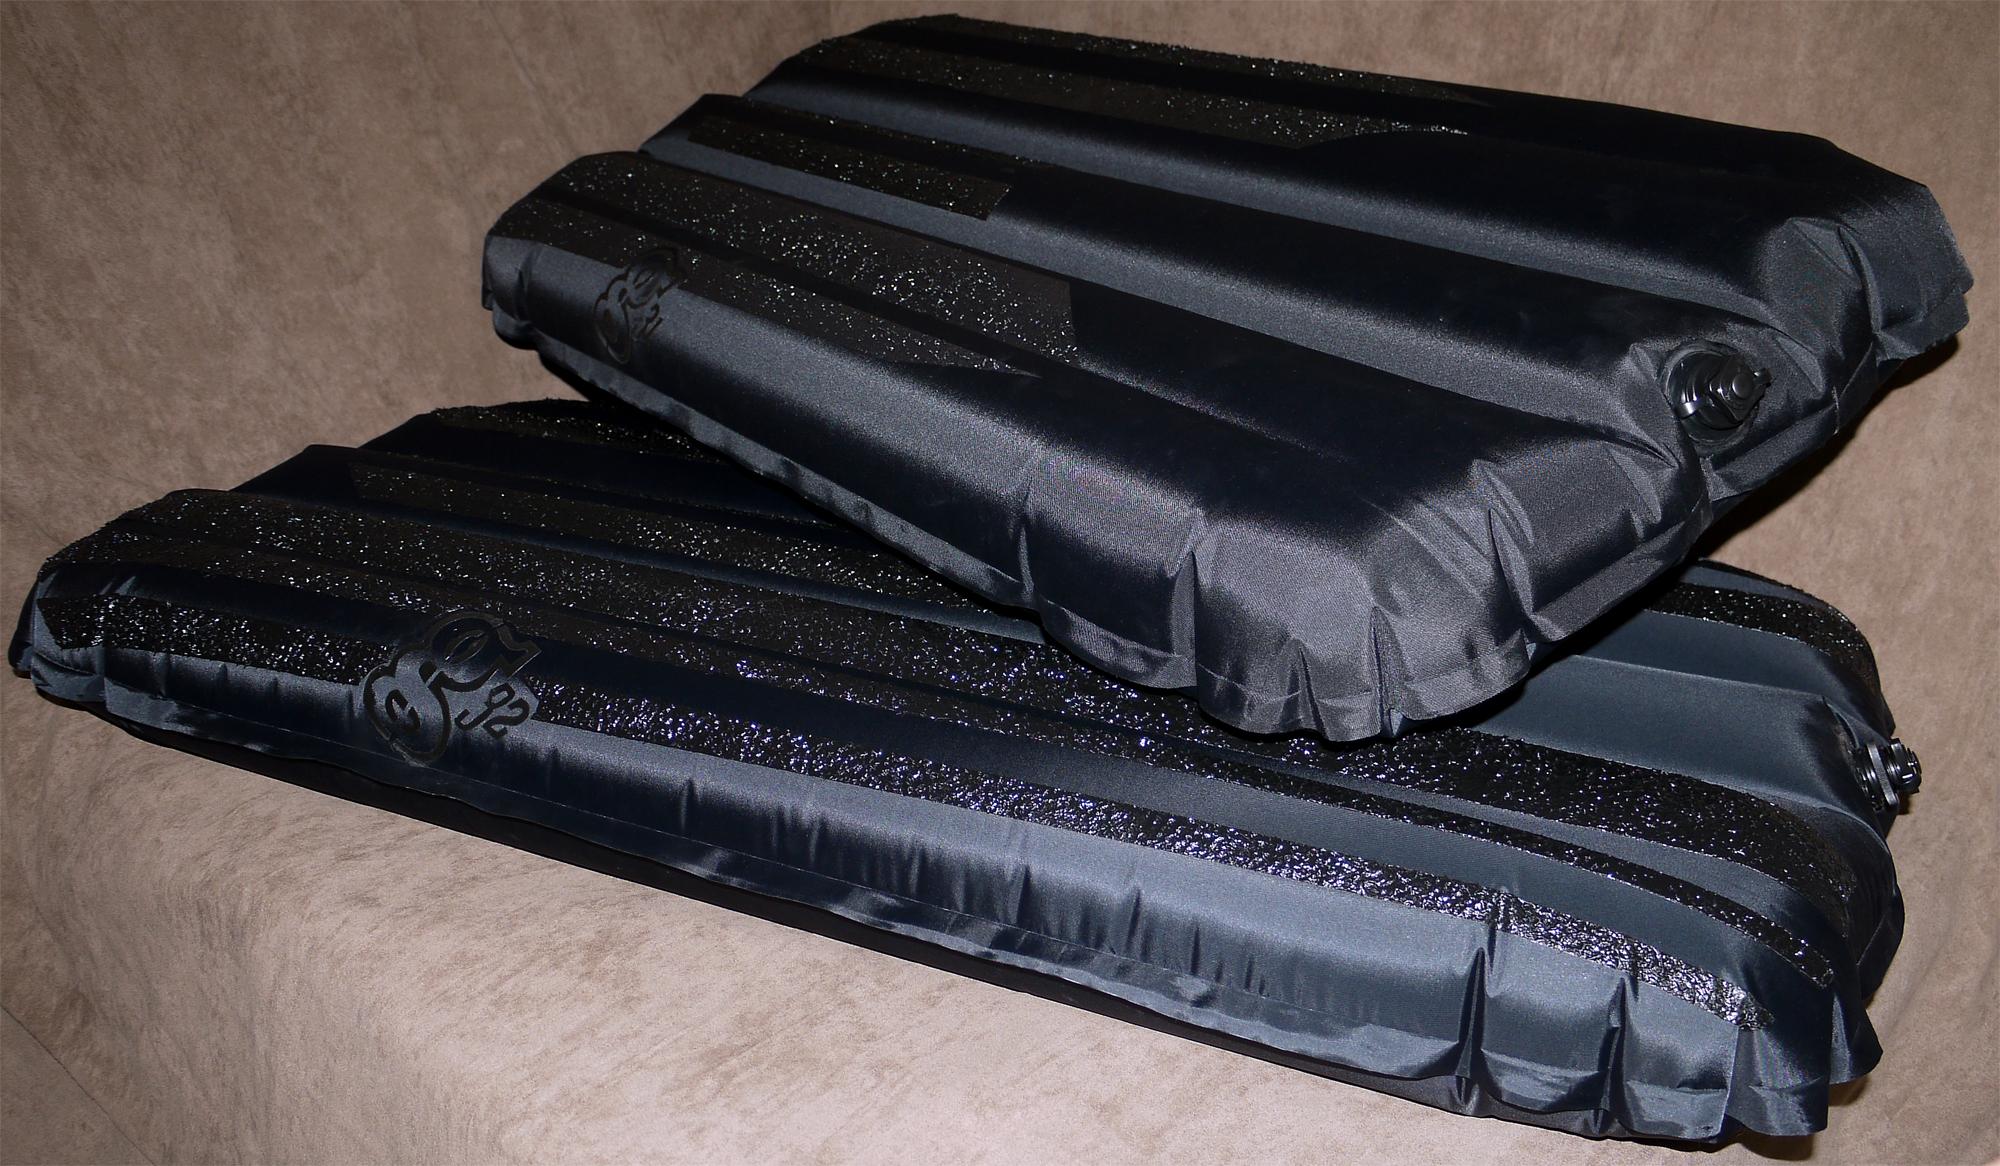 ASB's Rubber Bucky Proto's: 200/70 top, 70/70 bottom.